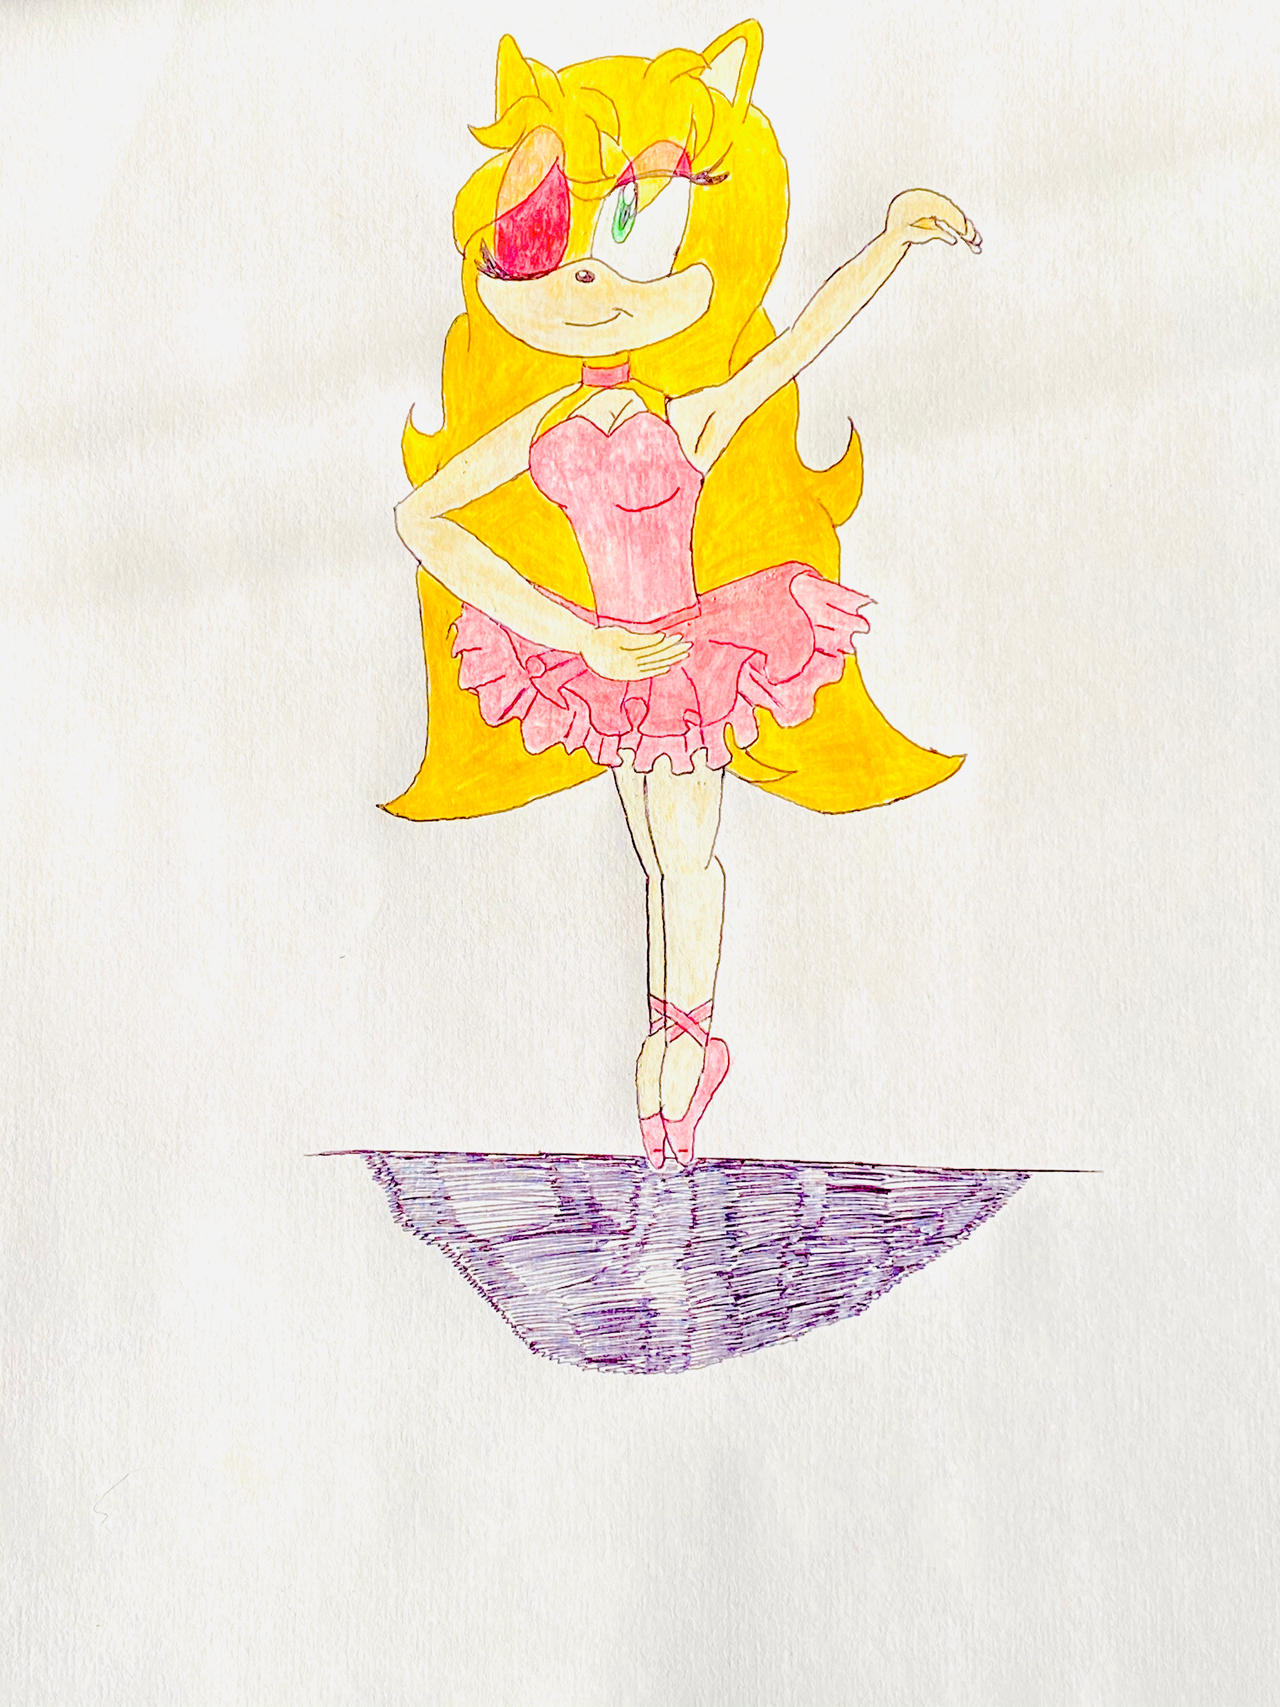 .:Request:. Ballerina Angelica wearing her Tutu